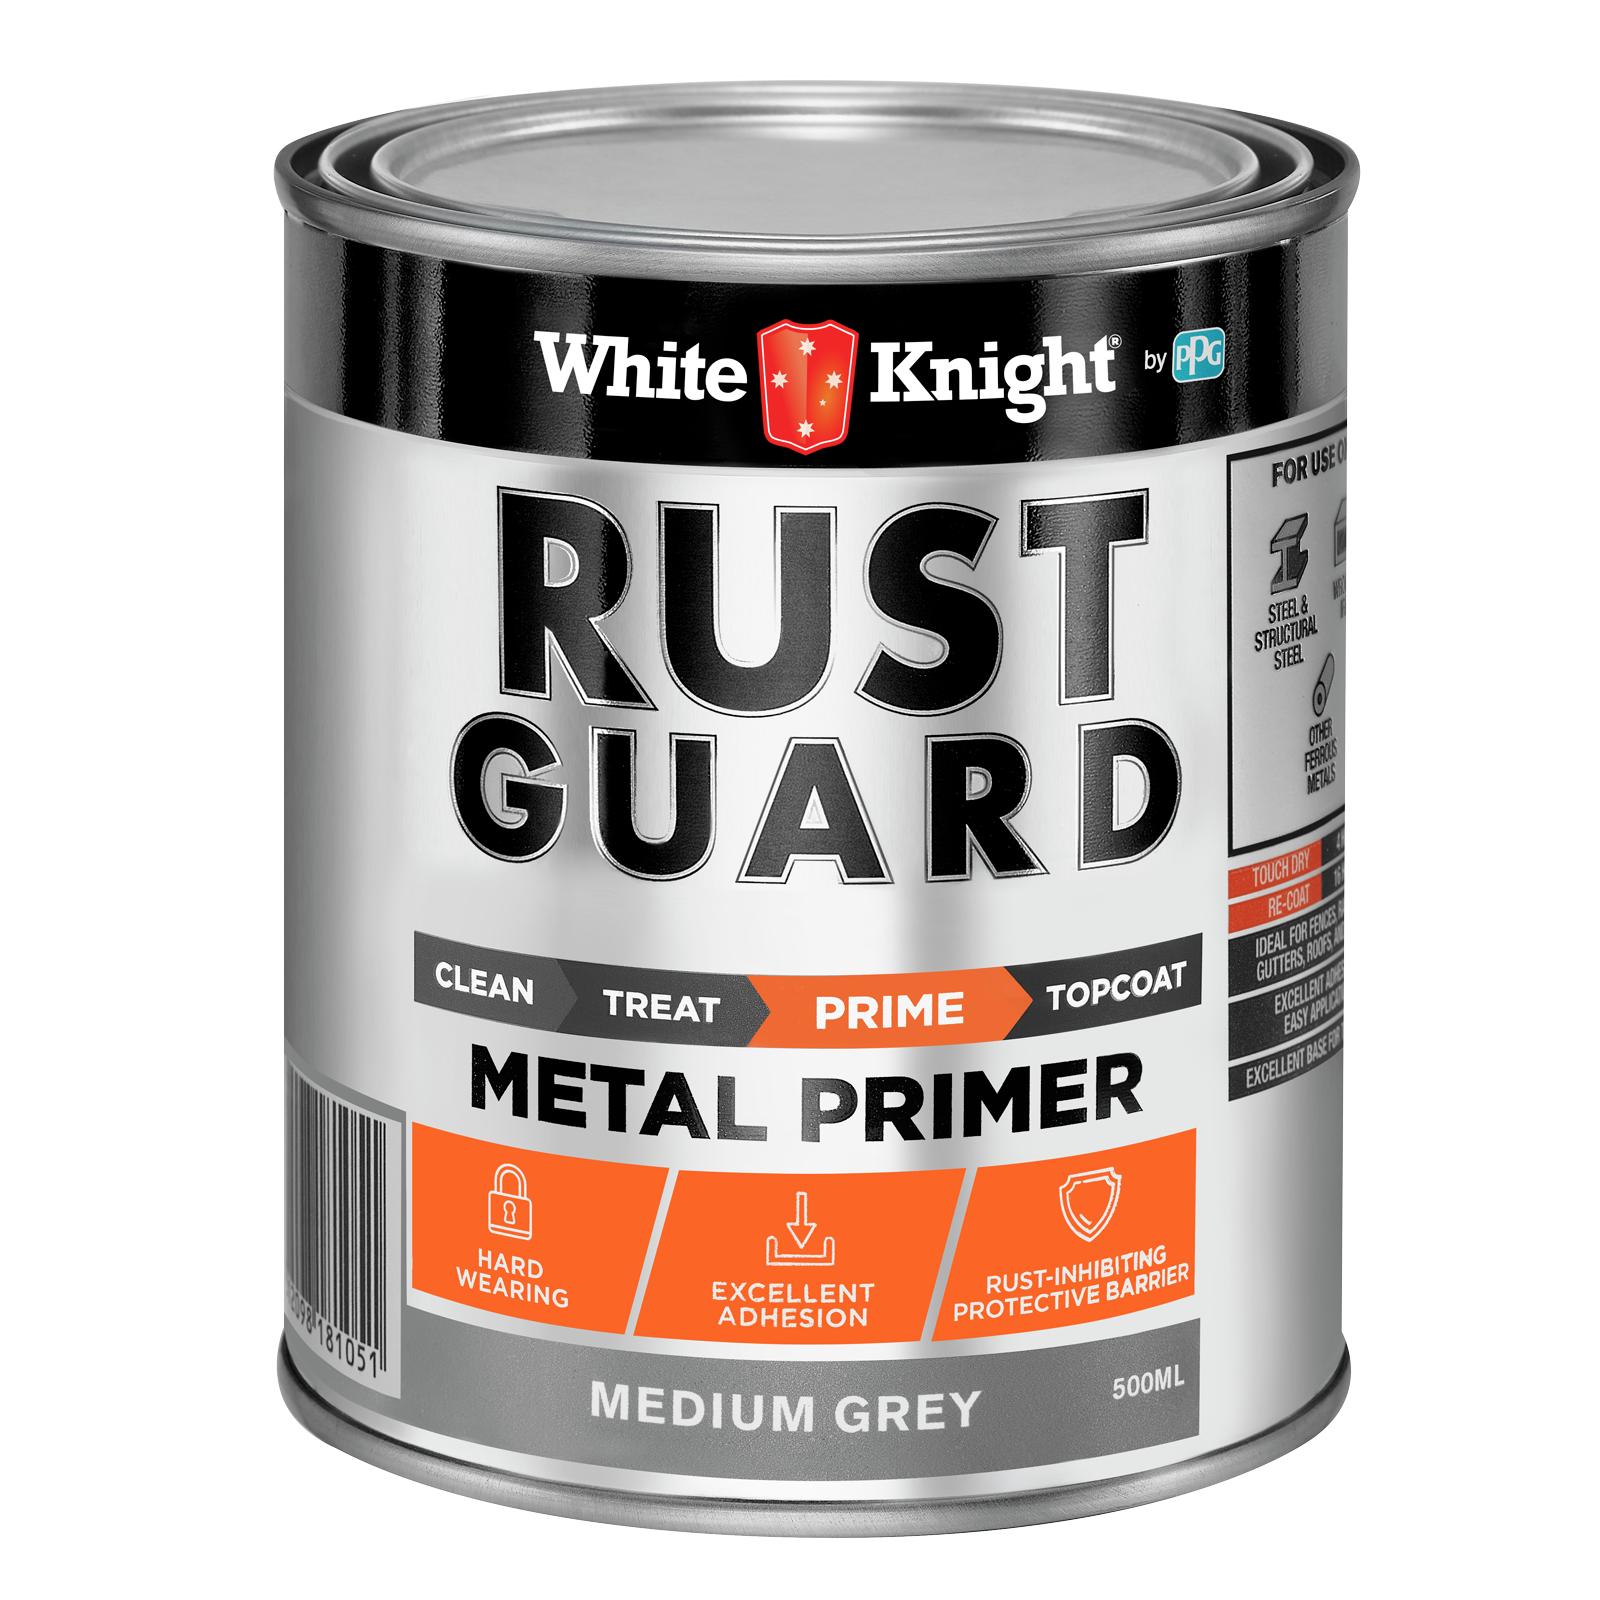 White Knight Rust Guard Medium Grey Metal Primer Paint - 0.5L